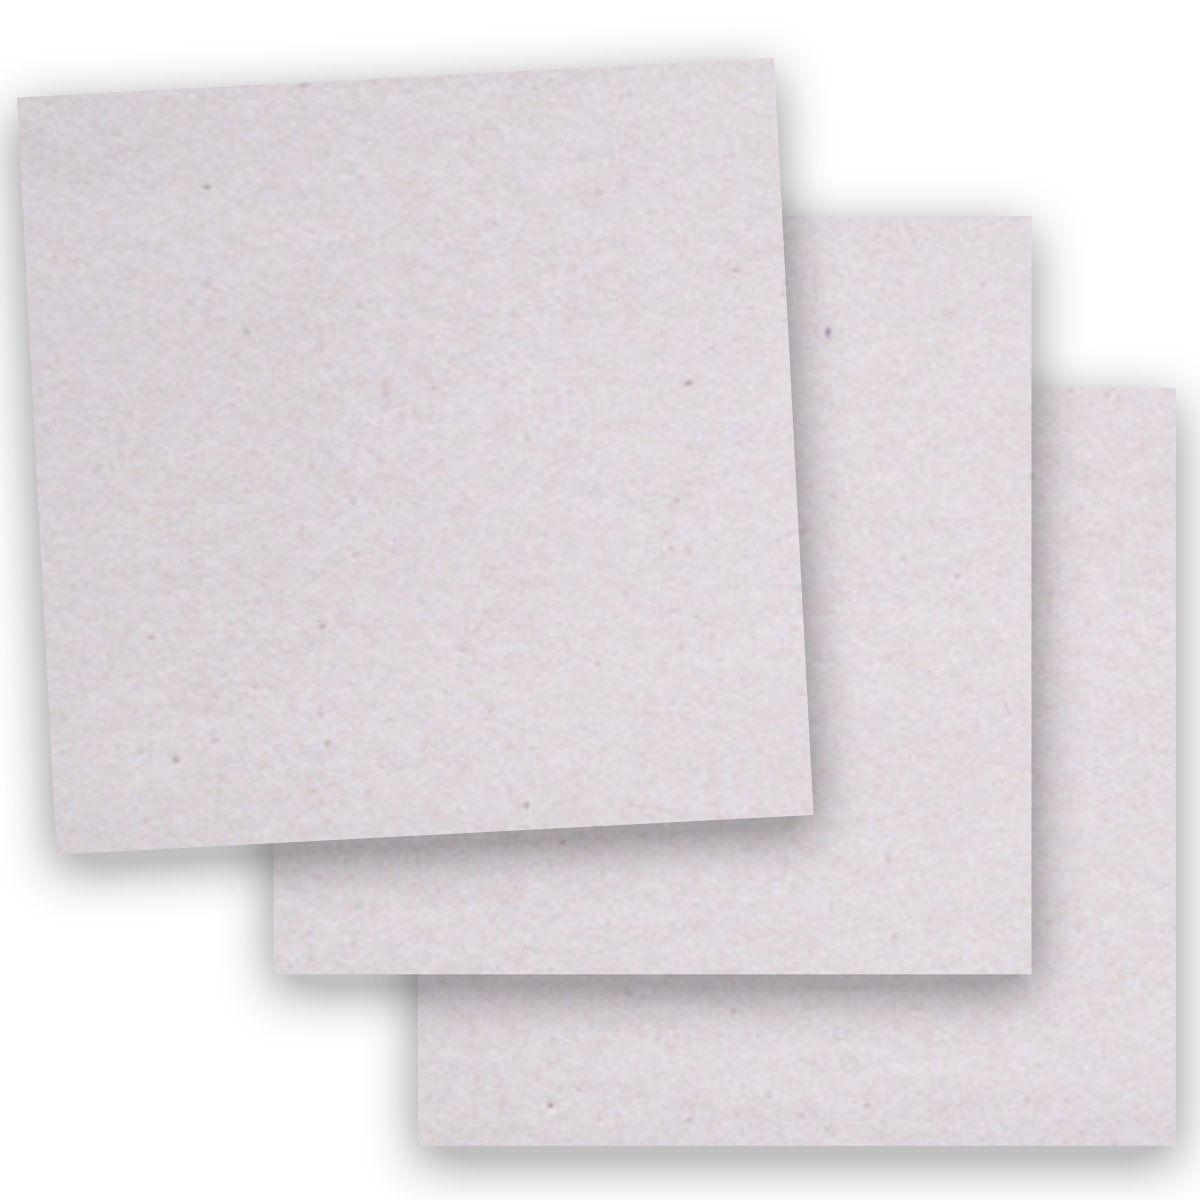 20 Sheets A4 Bright Gold Linen Textured Card 250gsm NEW